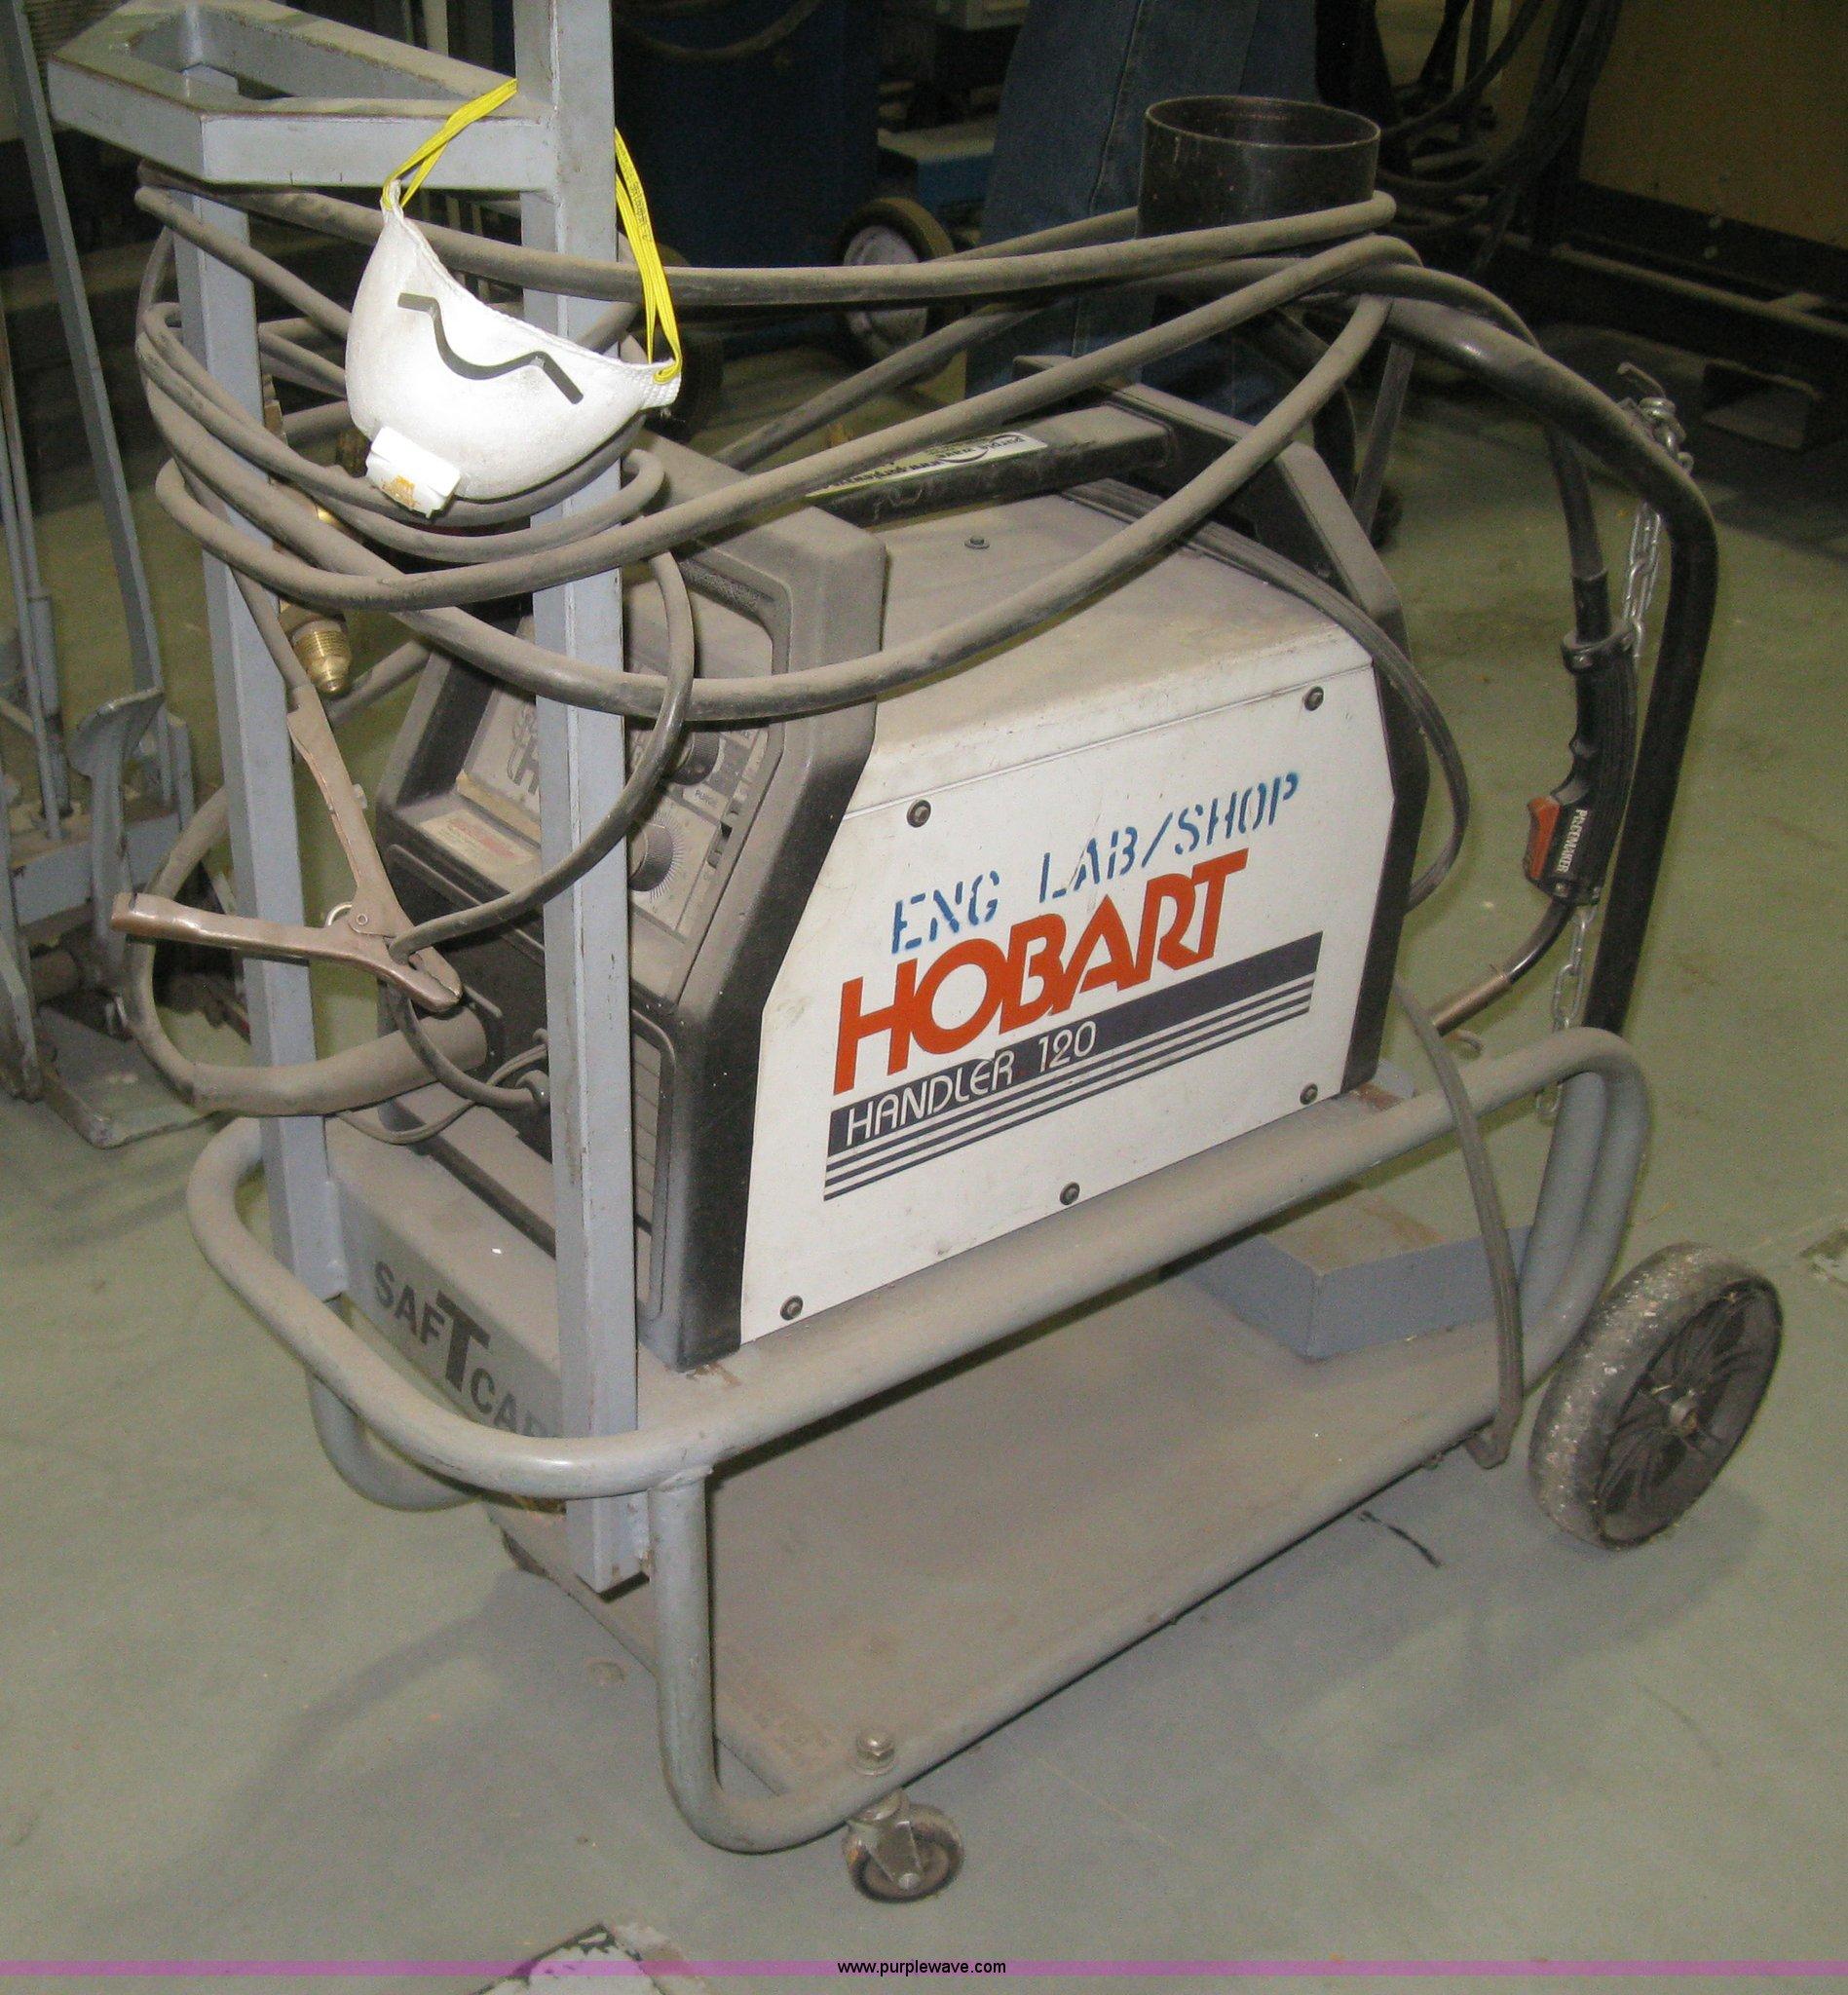 AX9561 hobart 120 handler wiring diagram hobart parts, hobart c44a hobart handler 120 wiring diagram at pacquiaovsvargaslive.co